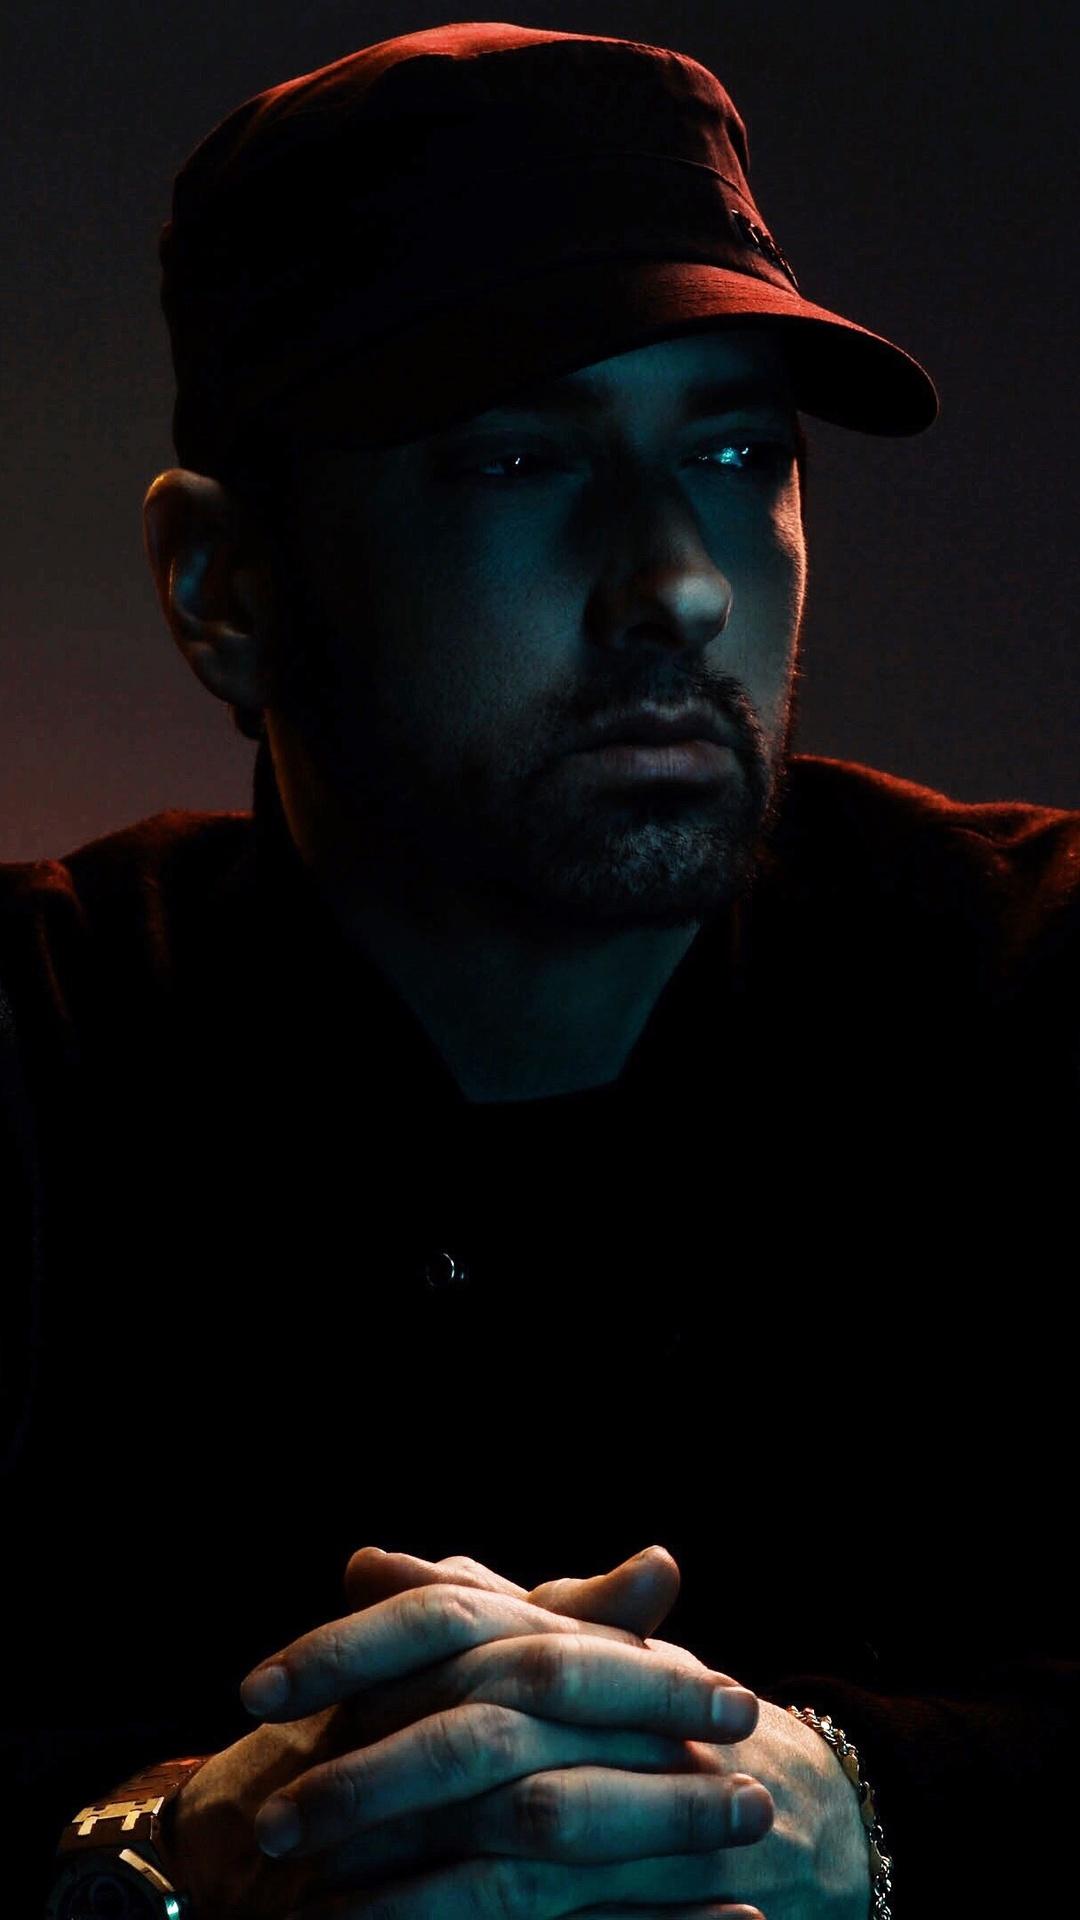 1080x1920 Eminem 4k 2018 Iphone 7,6s,6 Plus, Pixel xl ,One ...